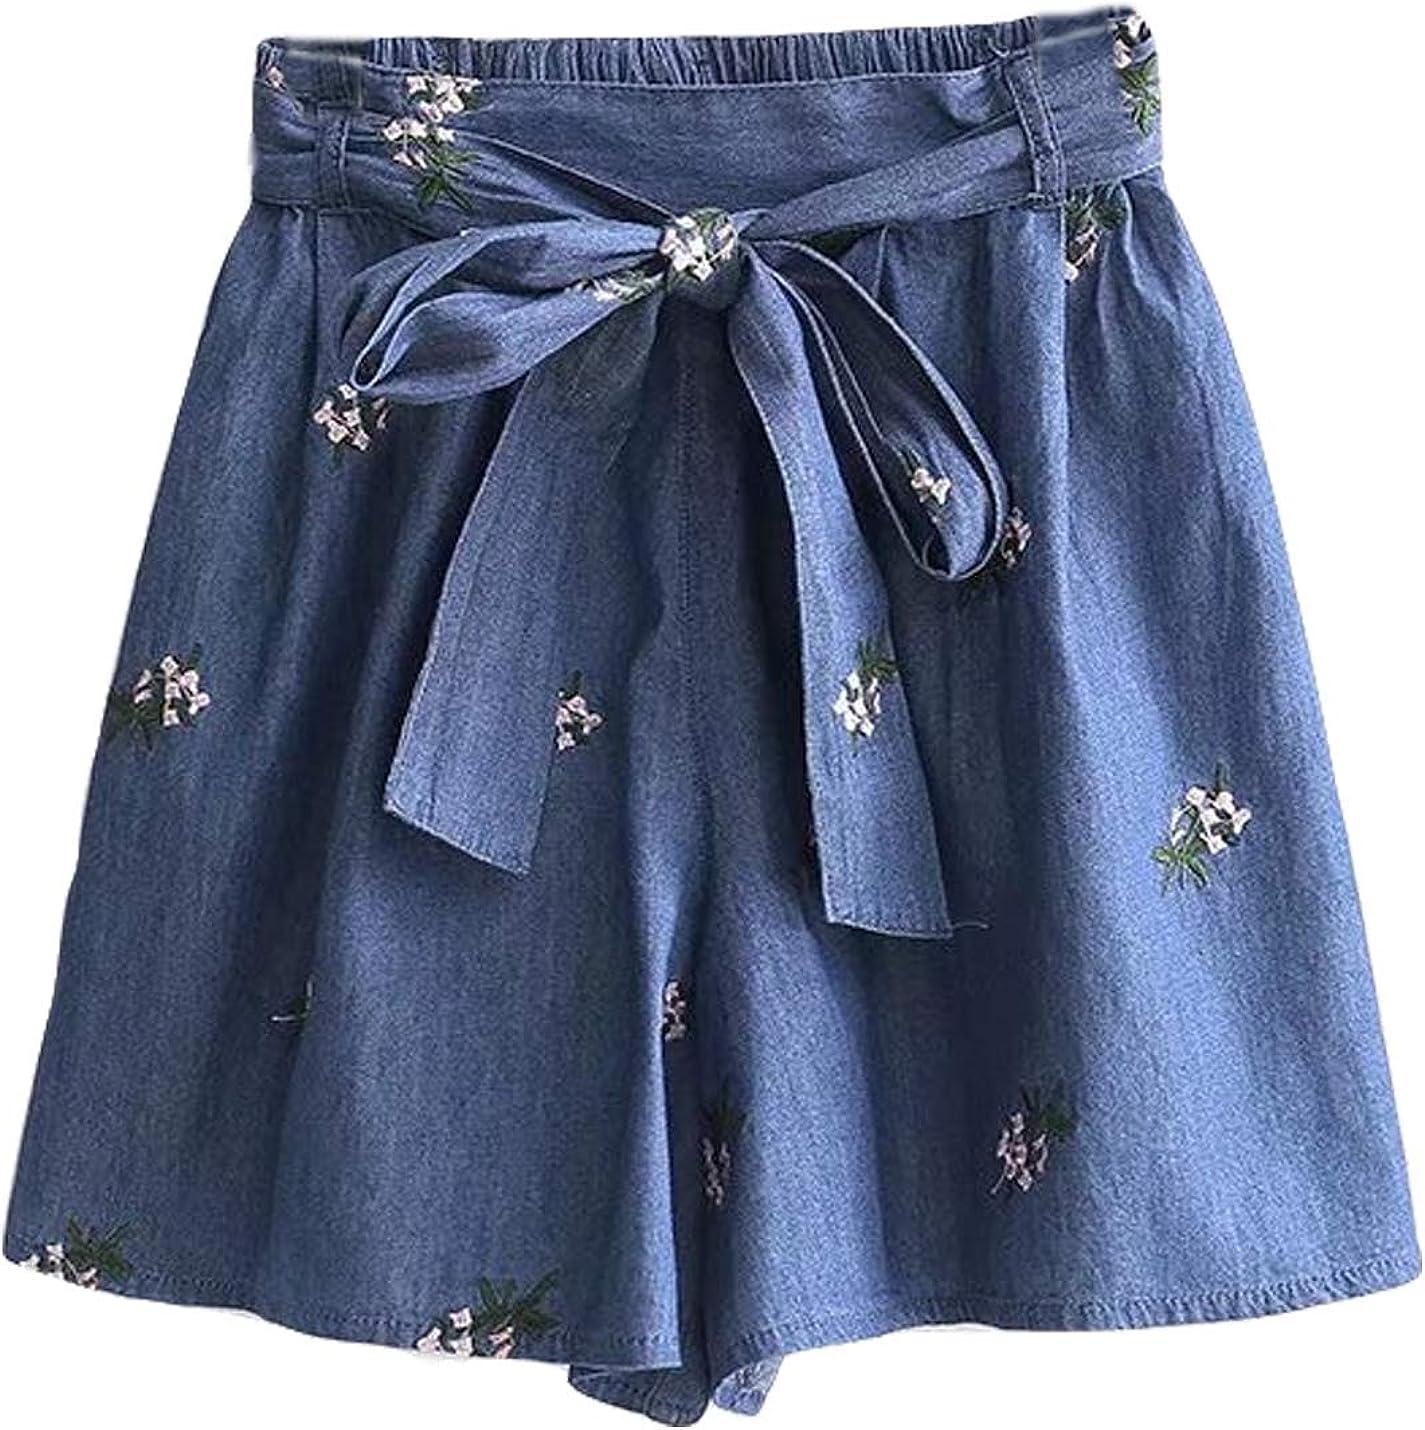 Yimoon Women's Elastic Waist Bowknot Tied Culottes Wide Leg Denim Shorts